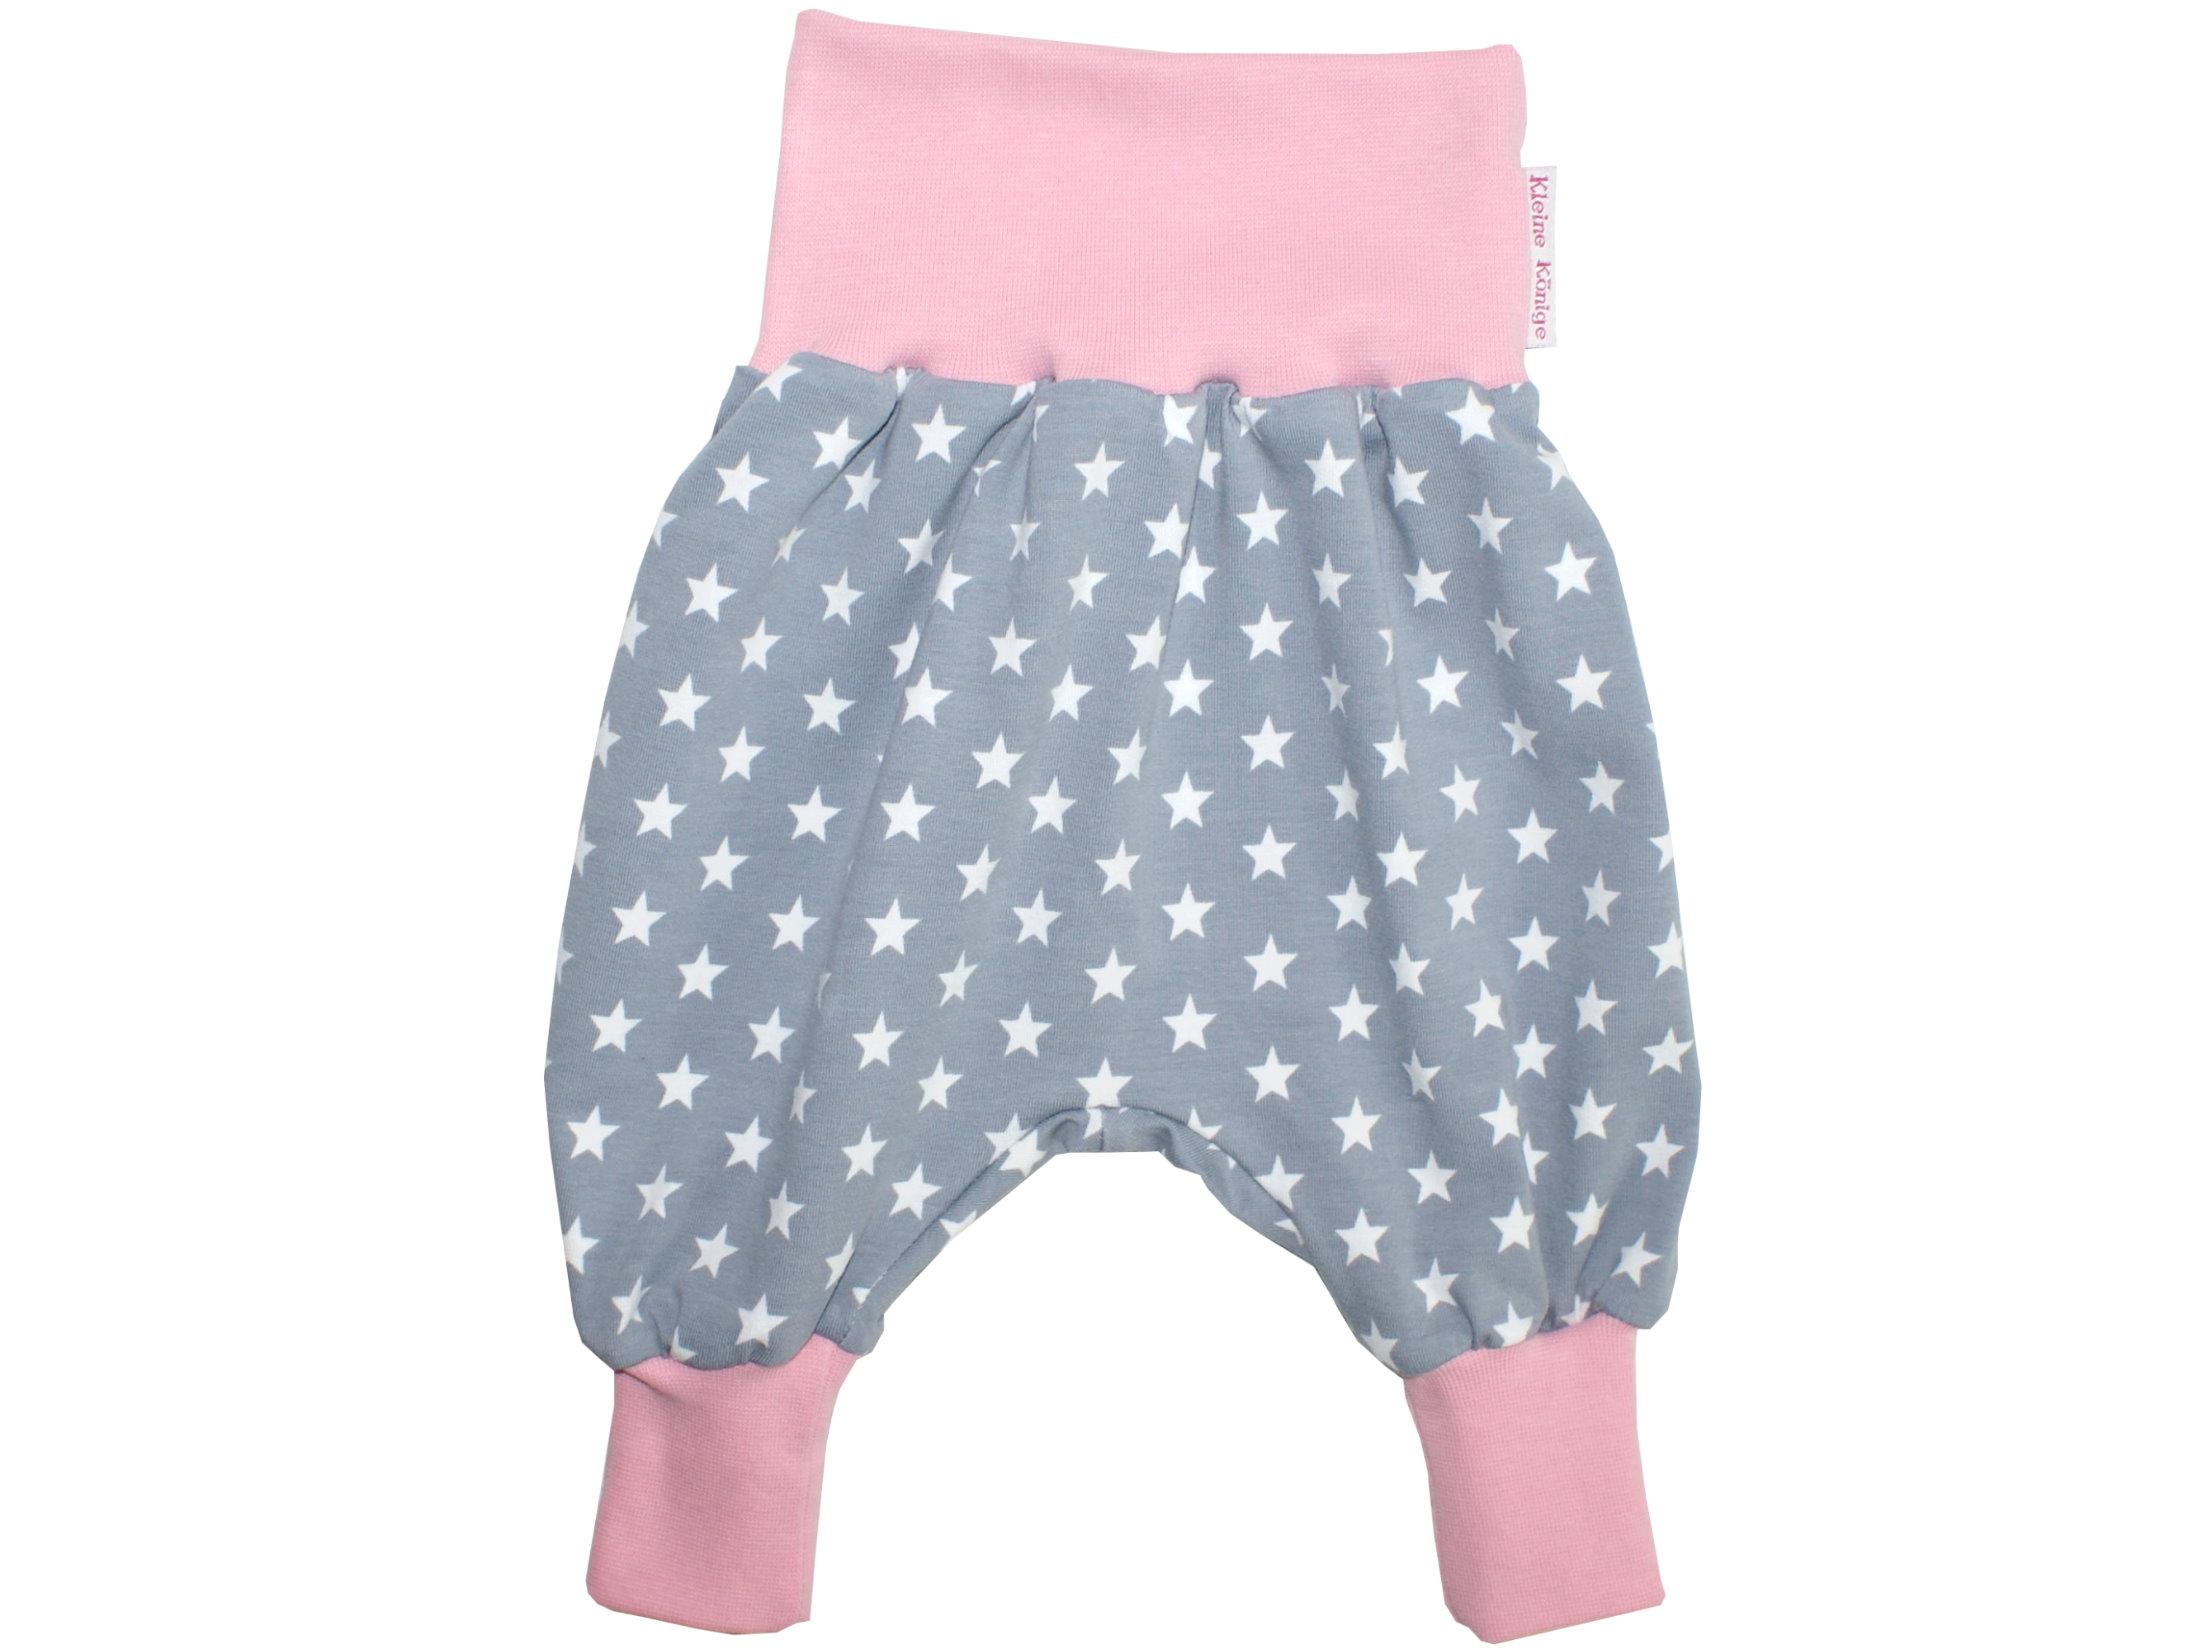 "Baby Pumphose Sterne ""Superstar"" grau rosa"